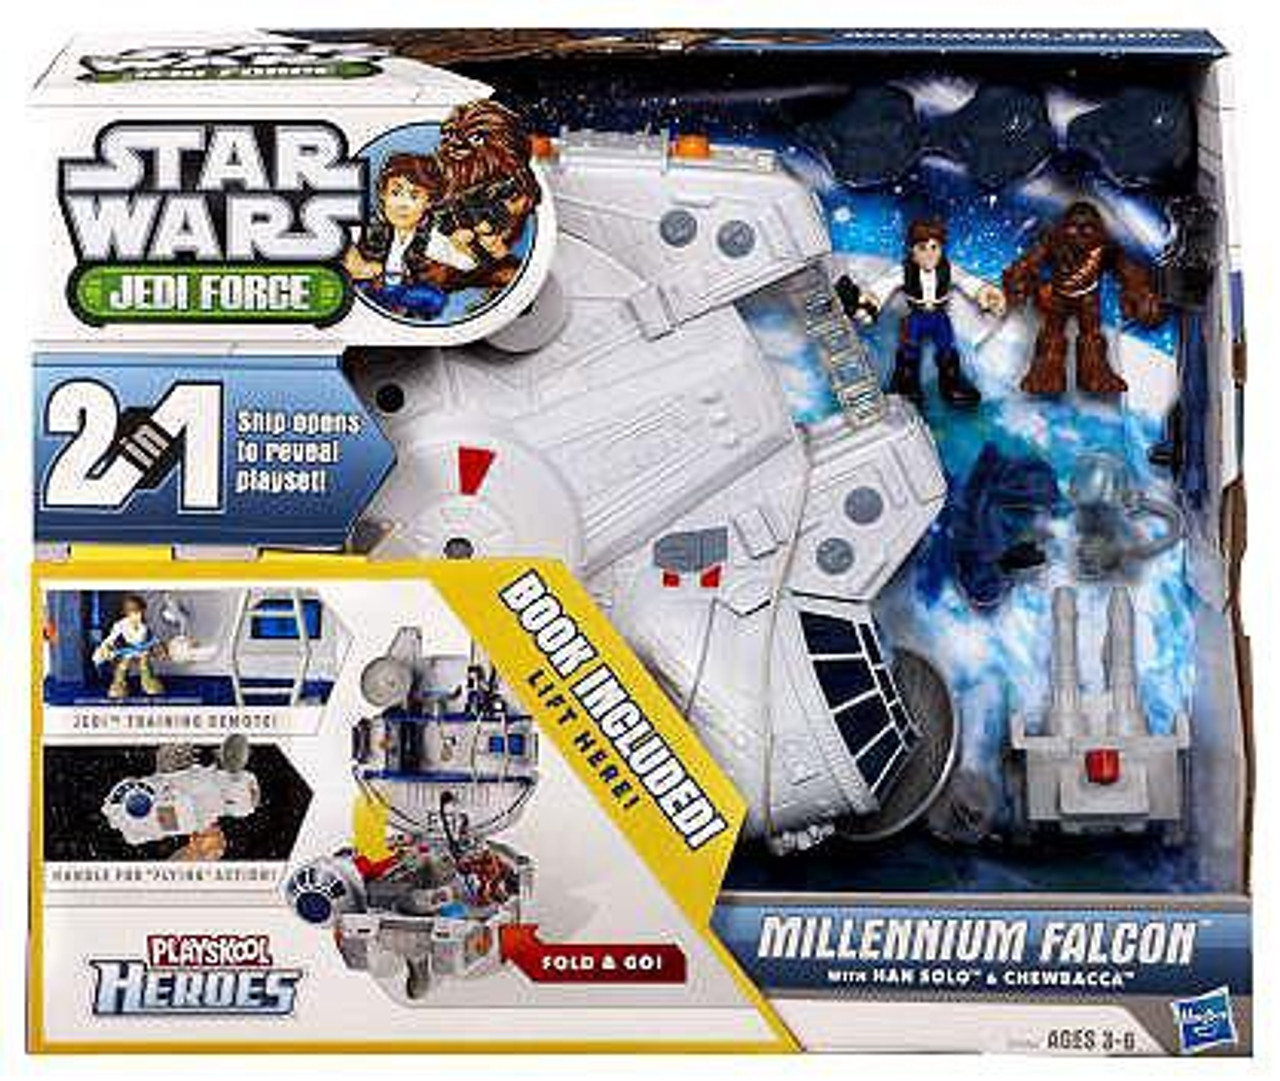 Star Wars Jedi Force Millennium Falcon Vehicle